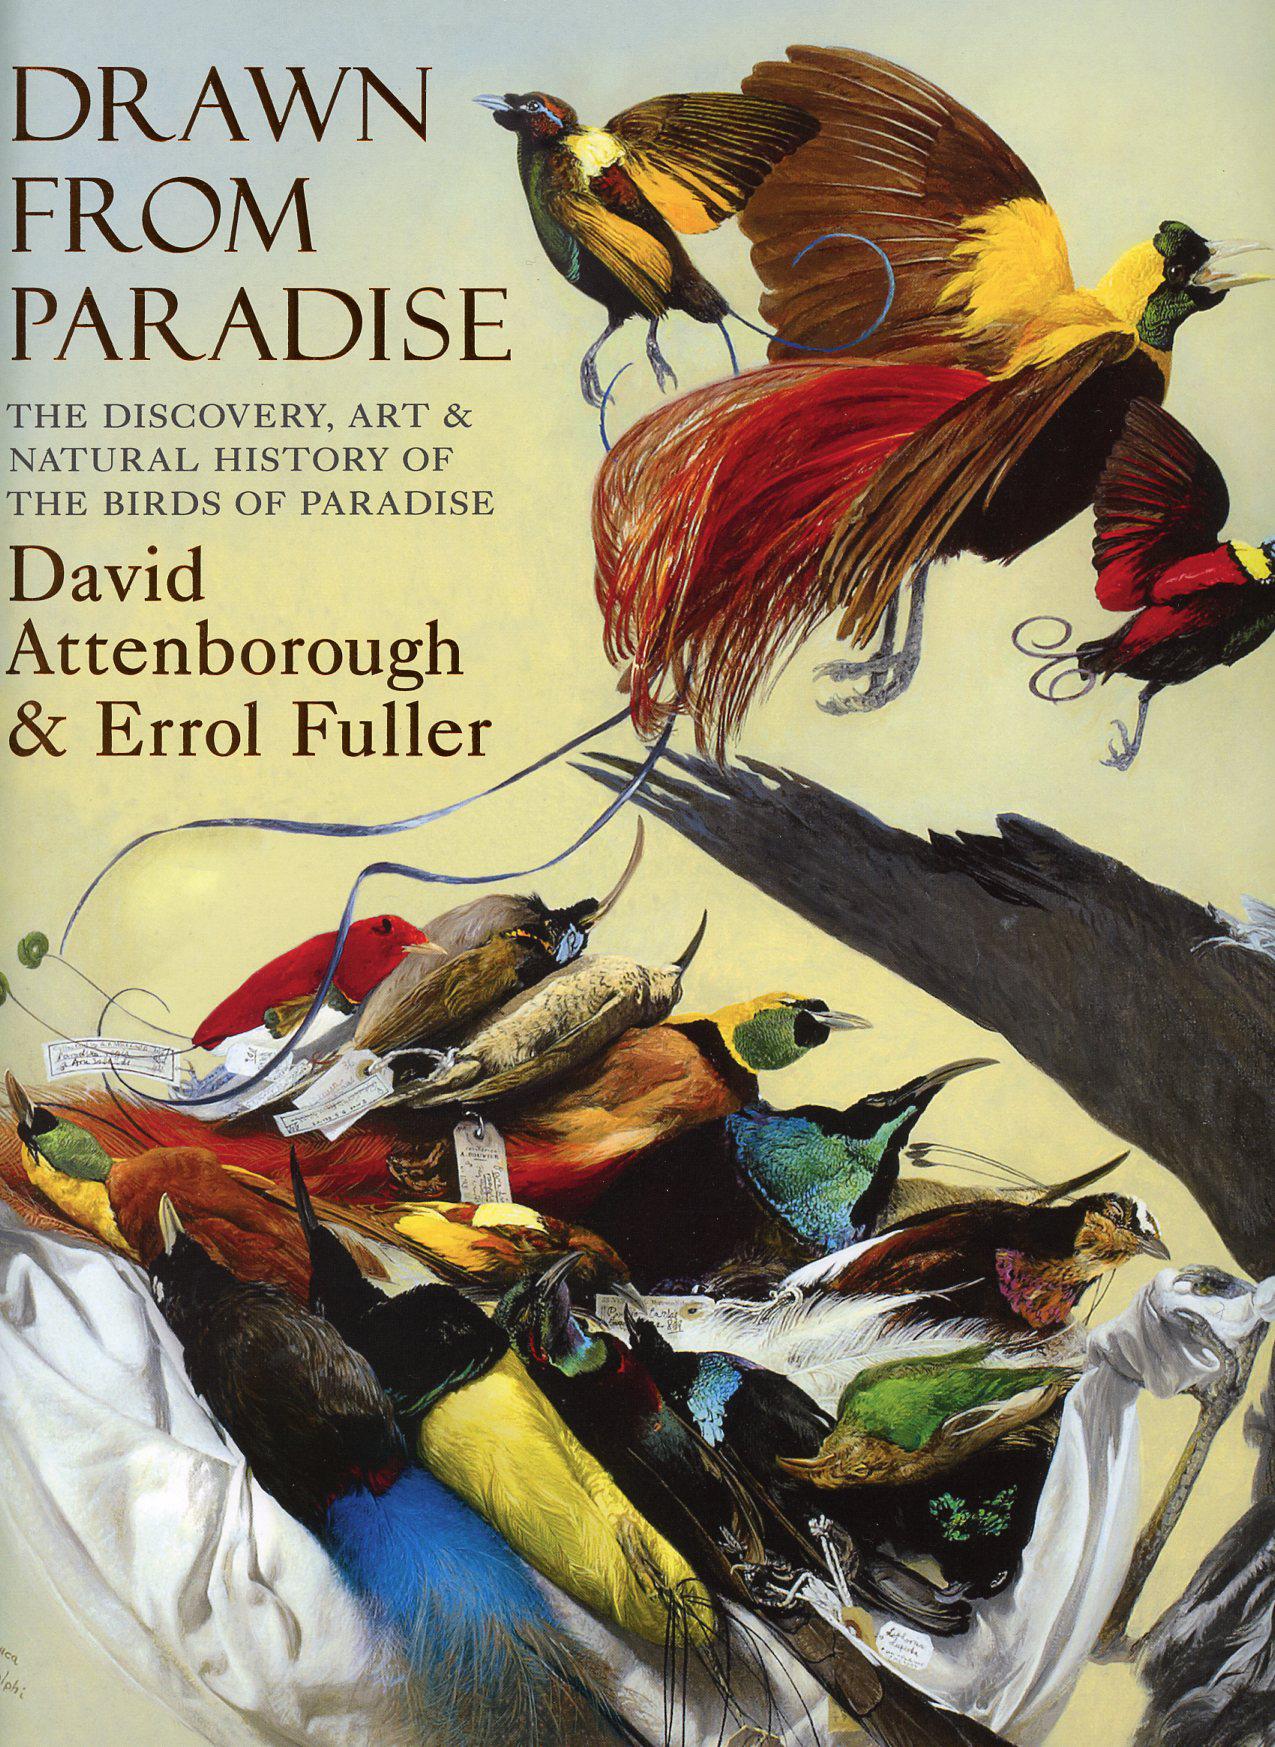 Drawn From Paradise.  David Attenborough & Errol Fuller.